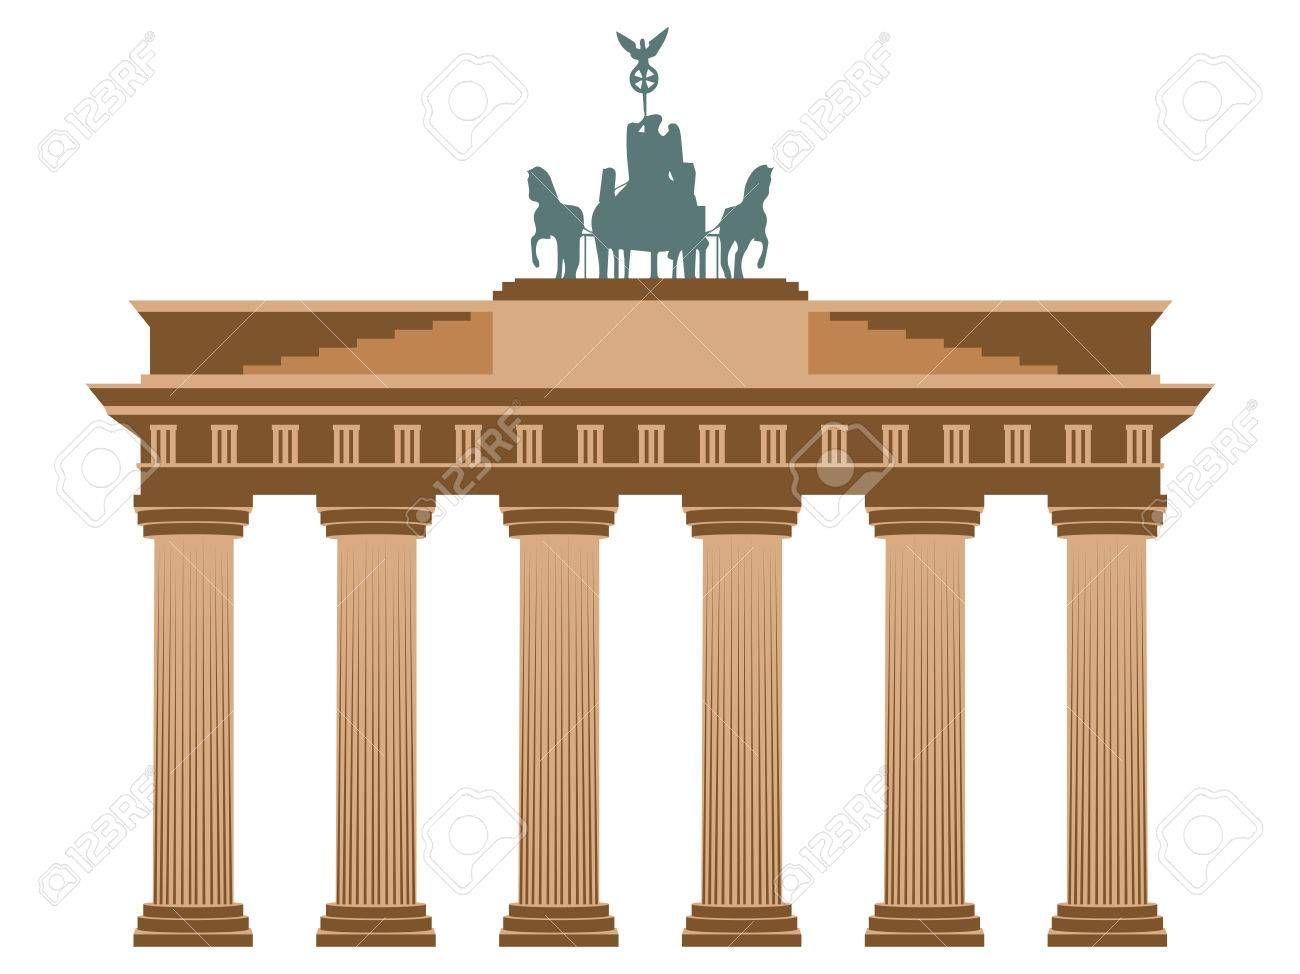 Brandenburg Gate In Berlin Isolated On White Background Illustration Affiliate Berlin Gate Brandenburg Isolated Illustration